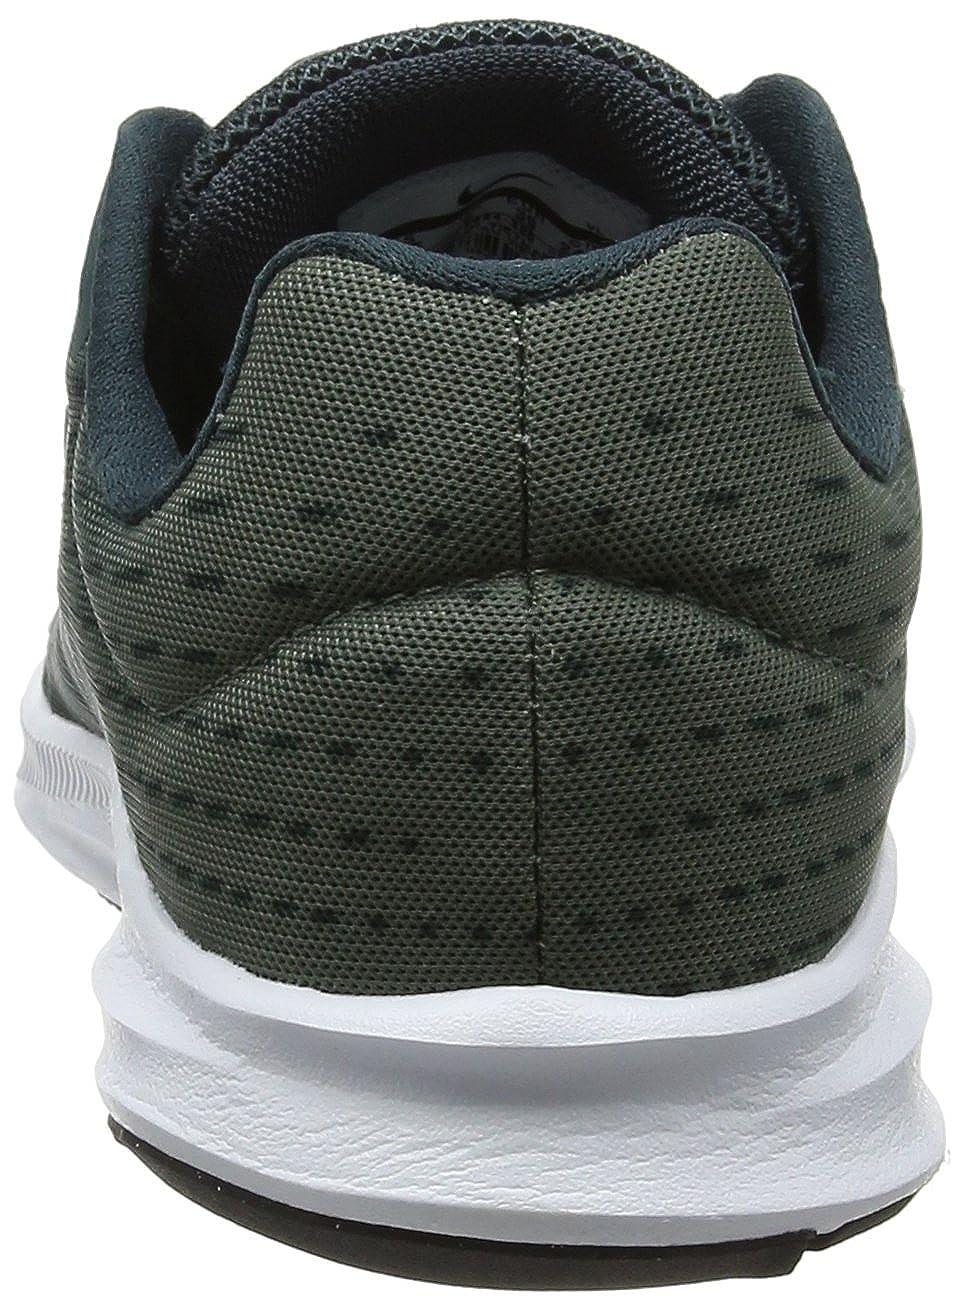 Nike Herren Downshifter 8 Laufschuhe Laufschuhe Laufschuhe B075ZYP2CJ  432a0e